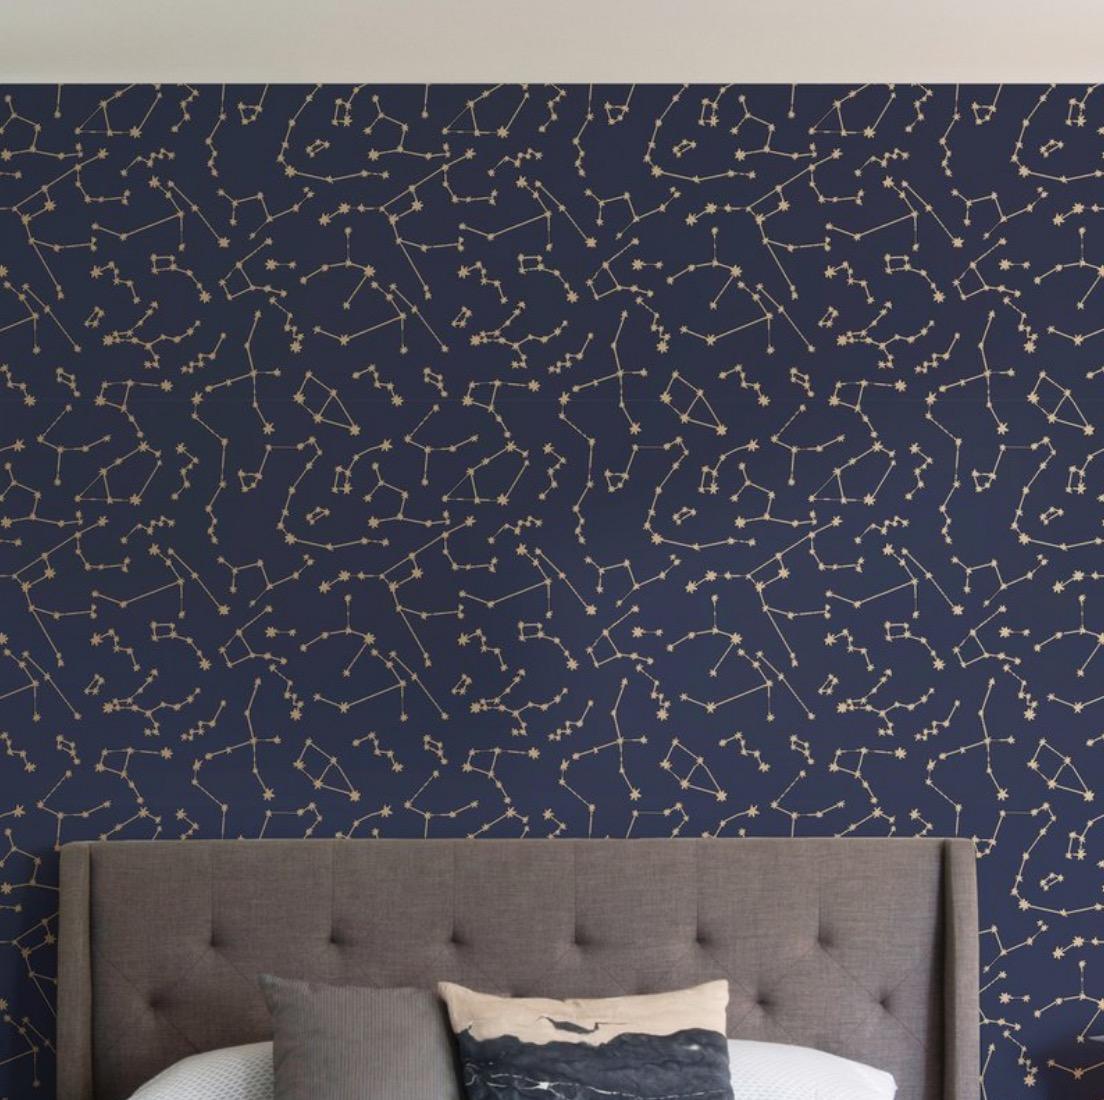 Novogratz Constellations Peel and Stick Wallpaper Roll